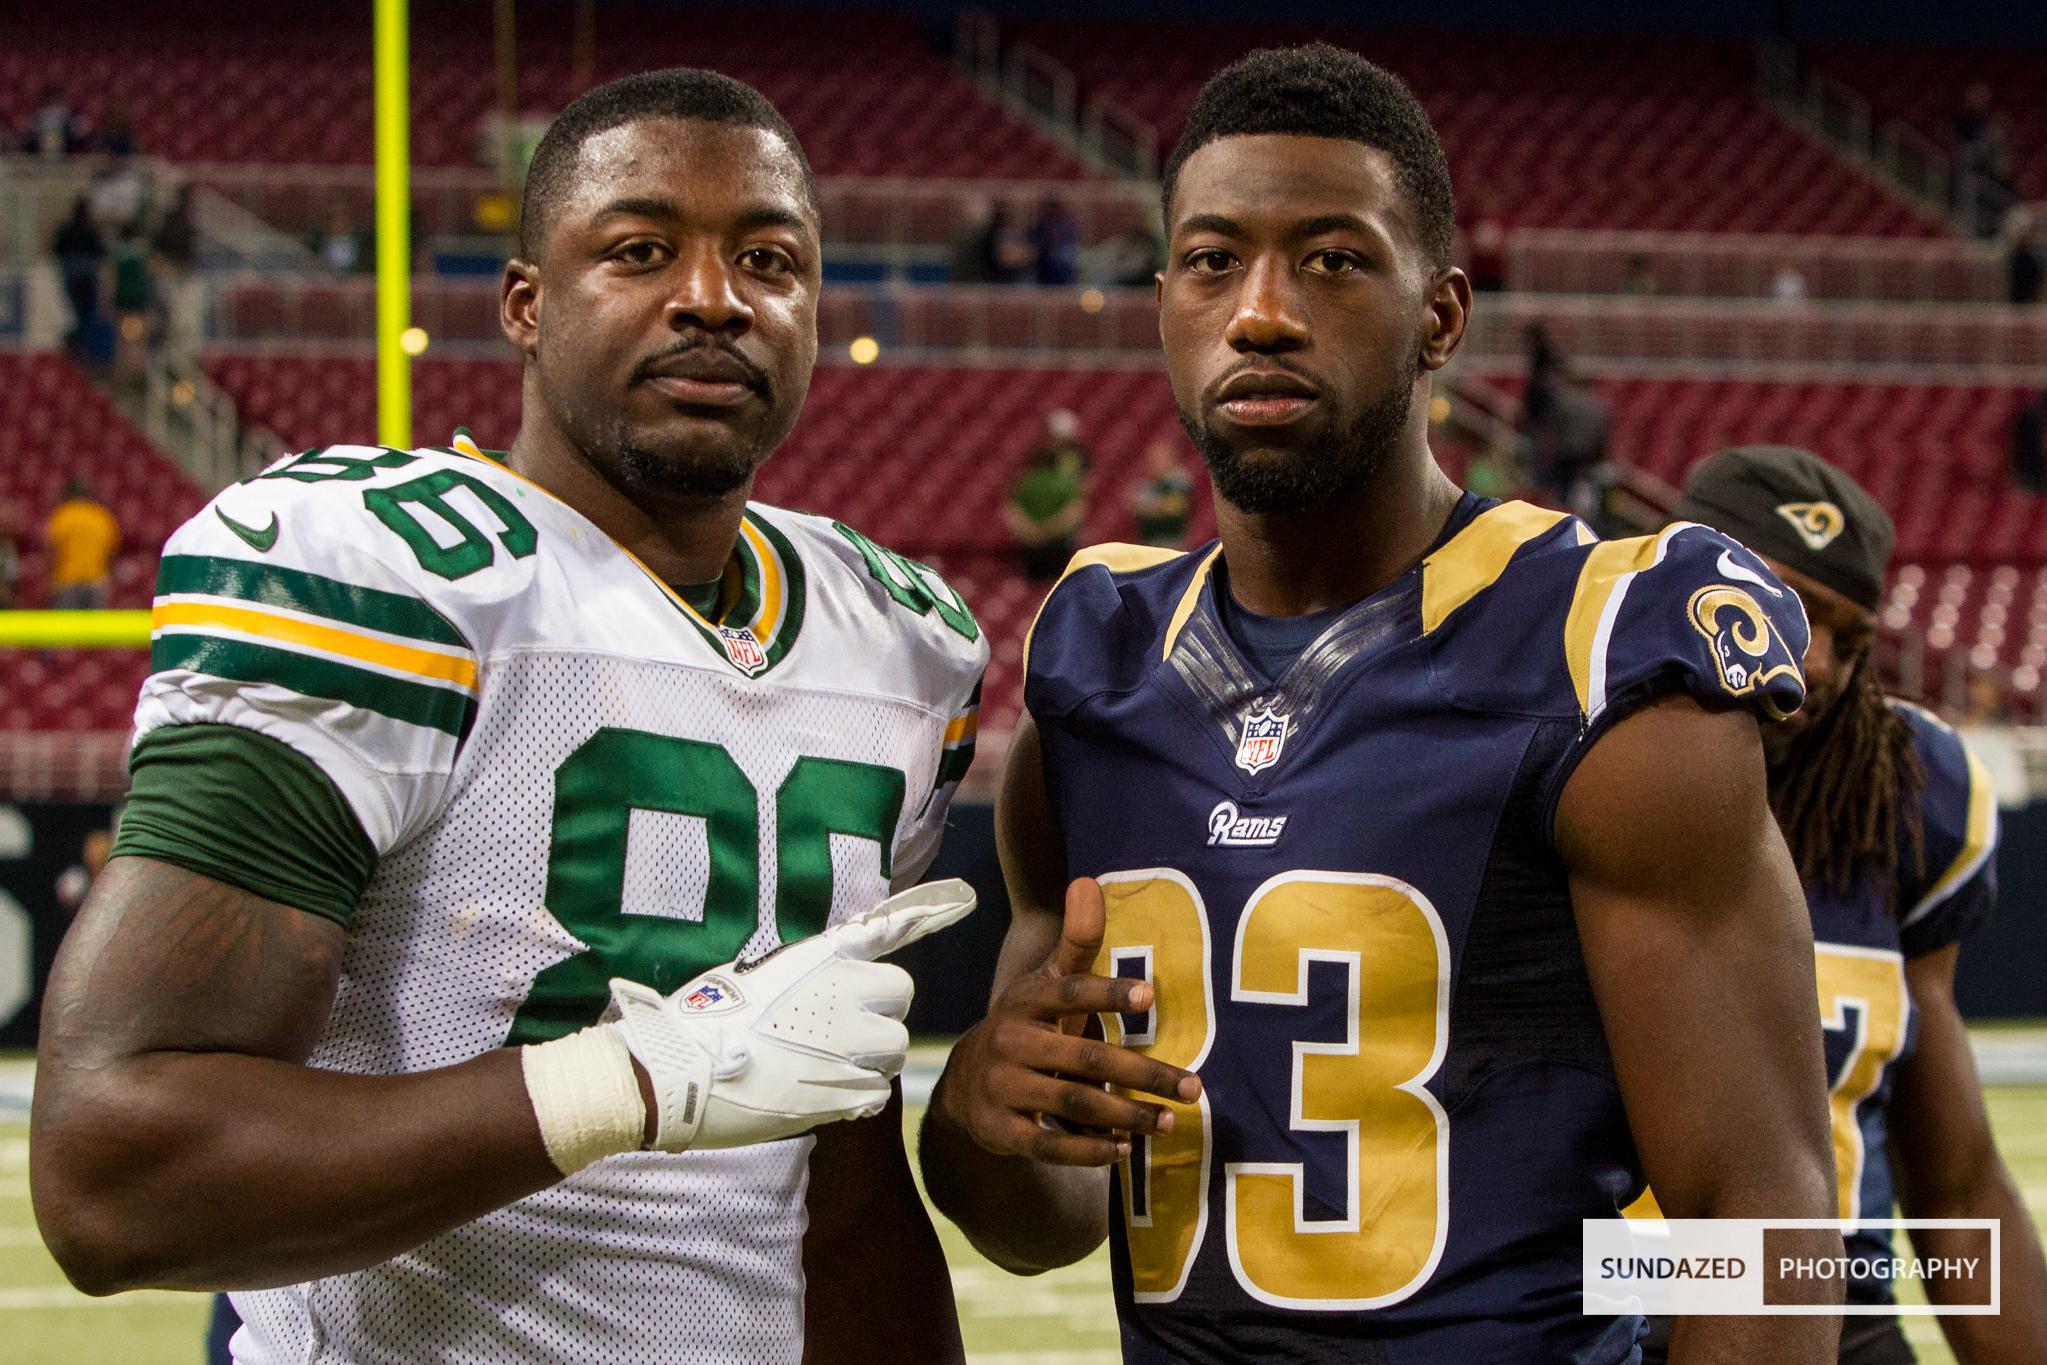 Sunday_NFL_STL_GB_1129.jpg